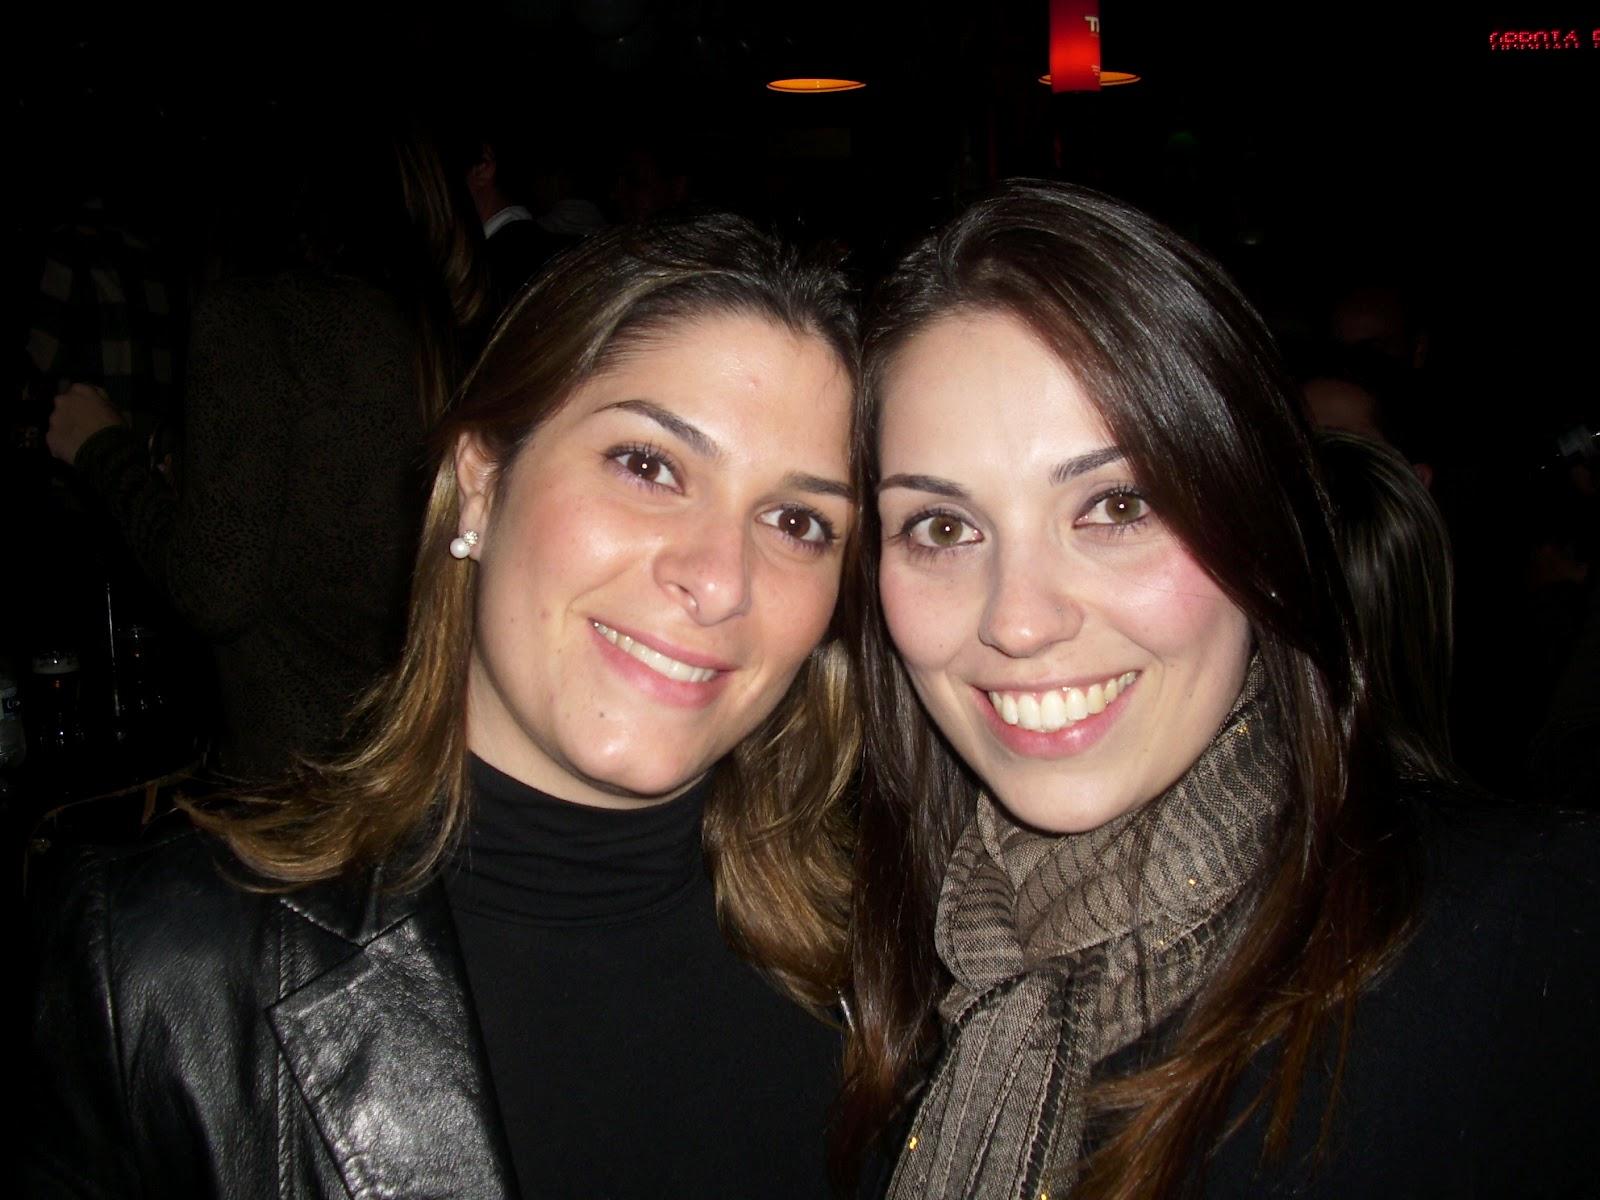 http://4.bp.blogspot.com/-c6QHVofvpYs/T9X3gbyhqGI/AAAAAAAAI8A/tPYIPUlN1KY/s1600/pepis+mariana+perrella+bianca+ponce.jpg